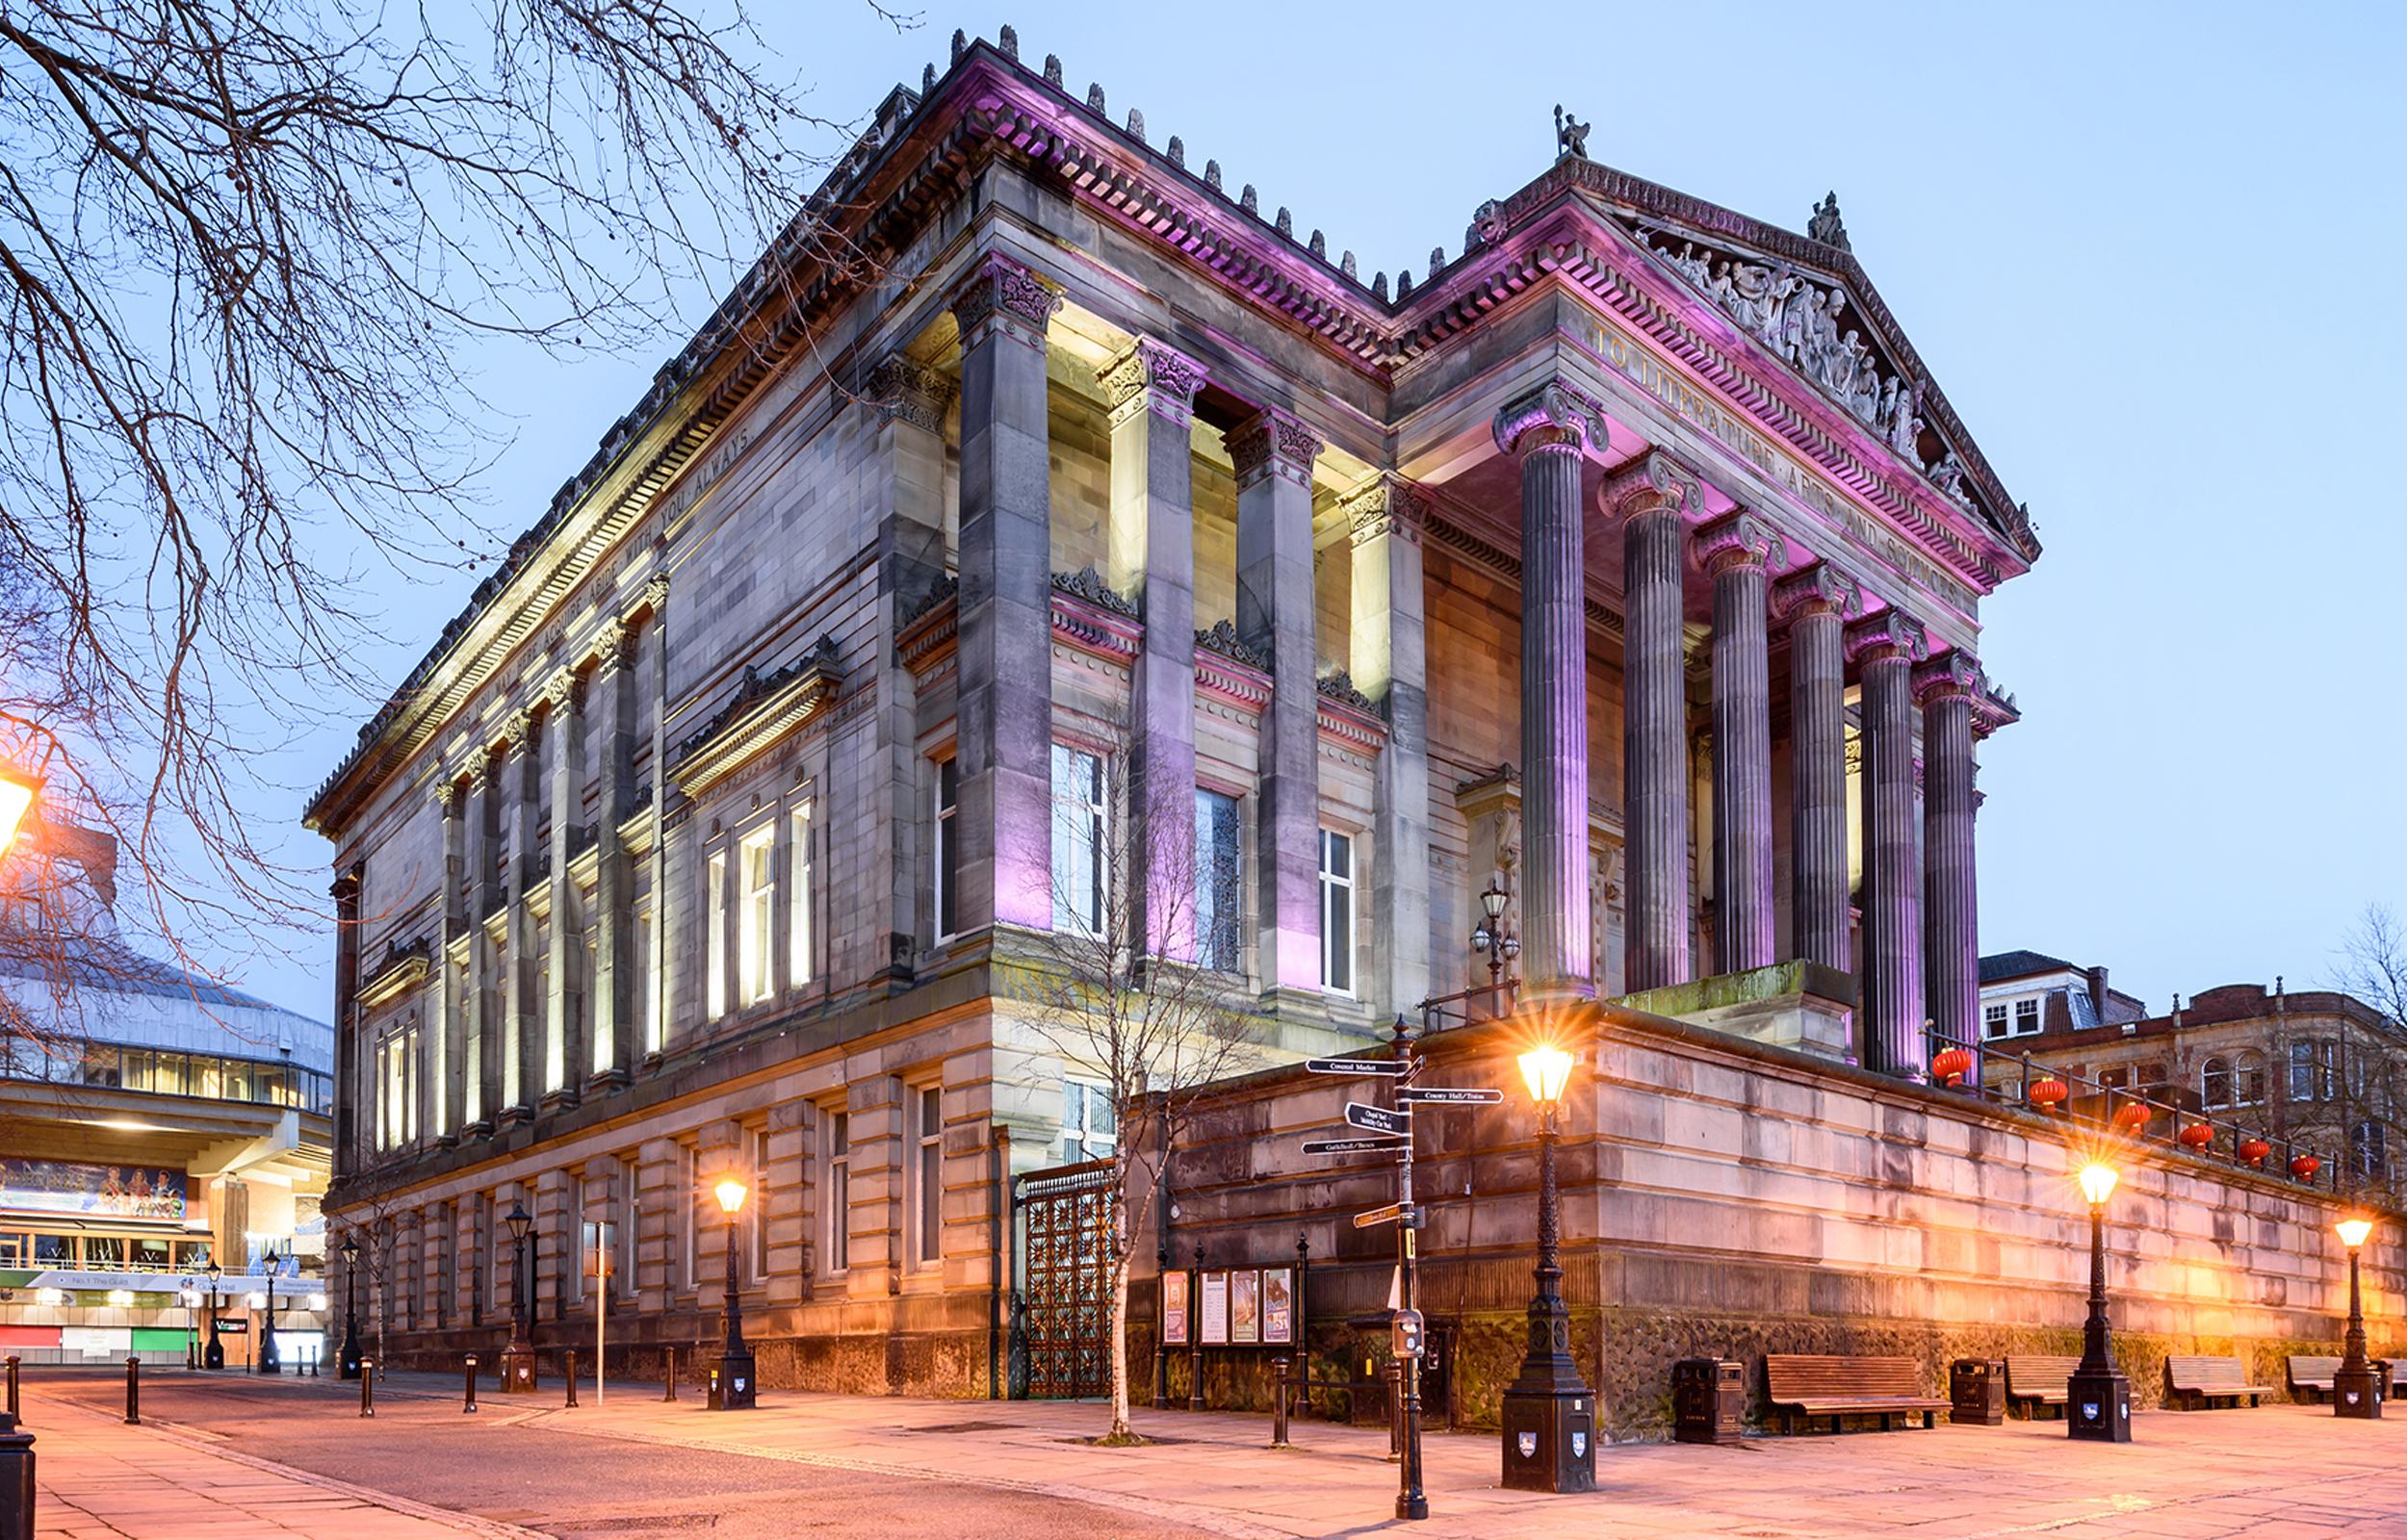 The Harris Museum, Art Gallery & Preston Free Public Library is